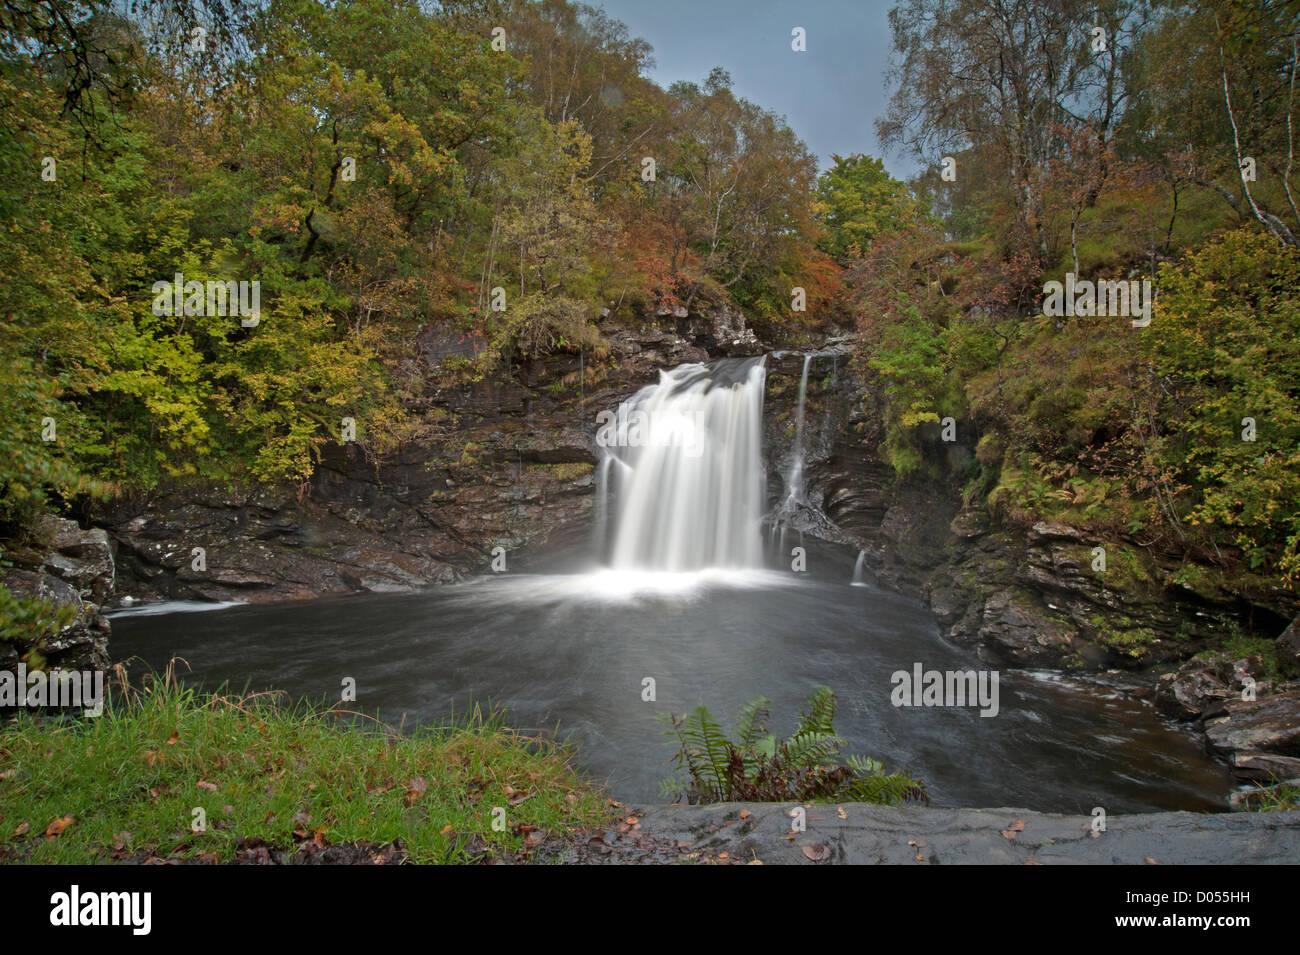 Falloch falls, Waterfall in the trossachs Scotland - Stock Image